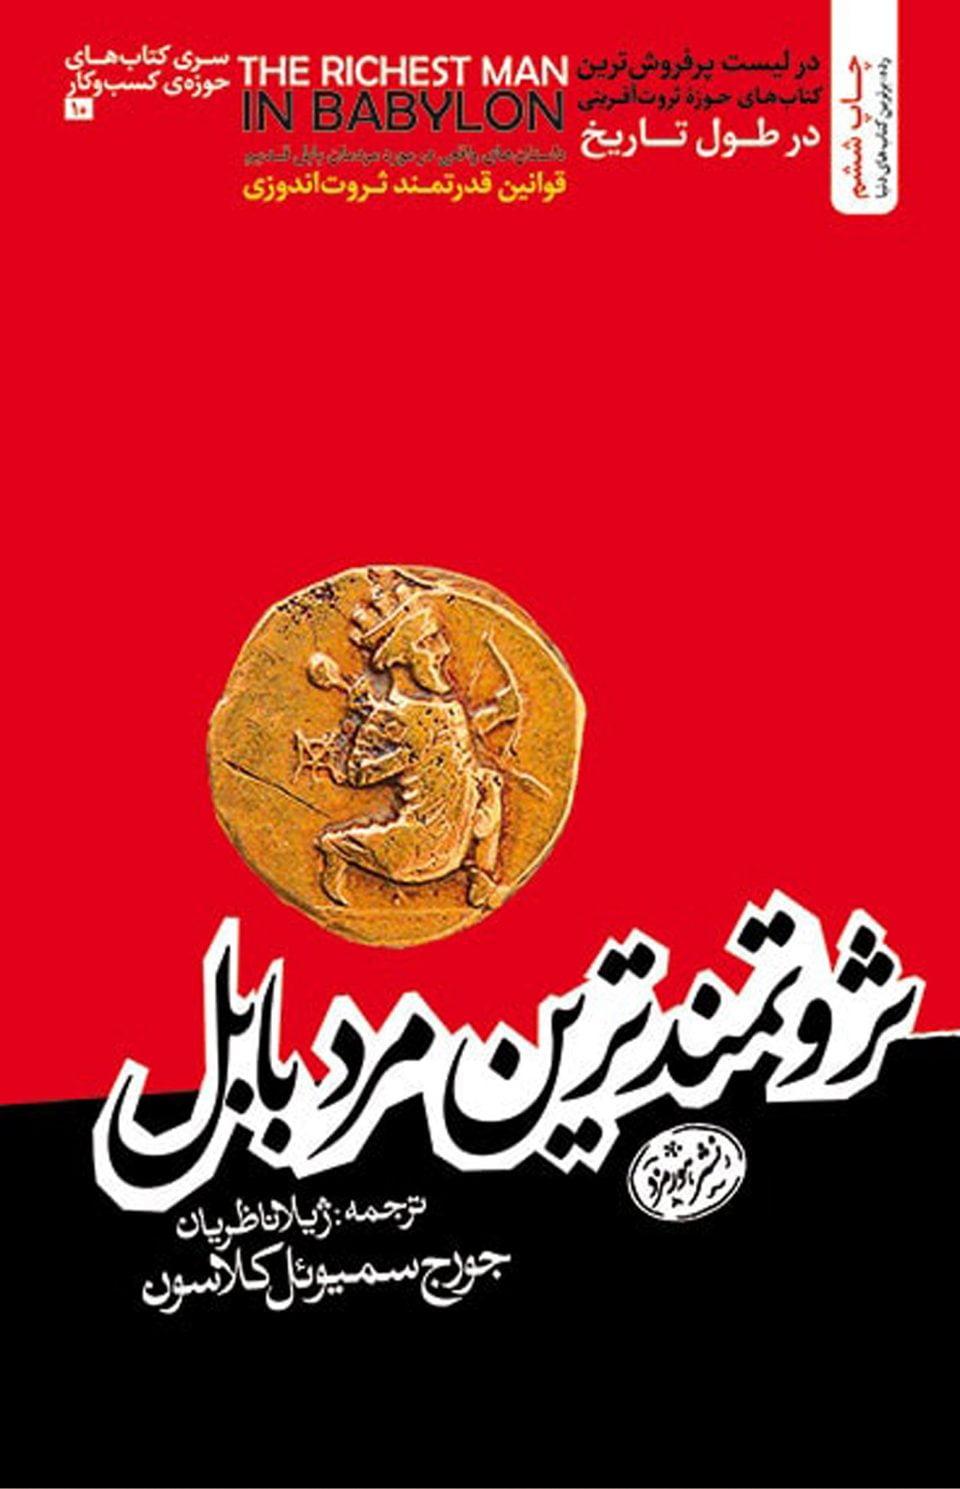 معرفی کتاب «ثروتمندترین مرد بابل» نوشته جورج سمیوئل کلاسون